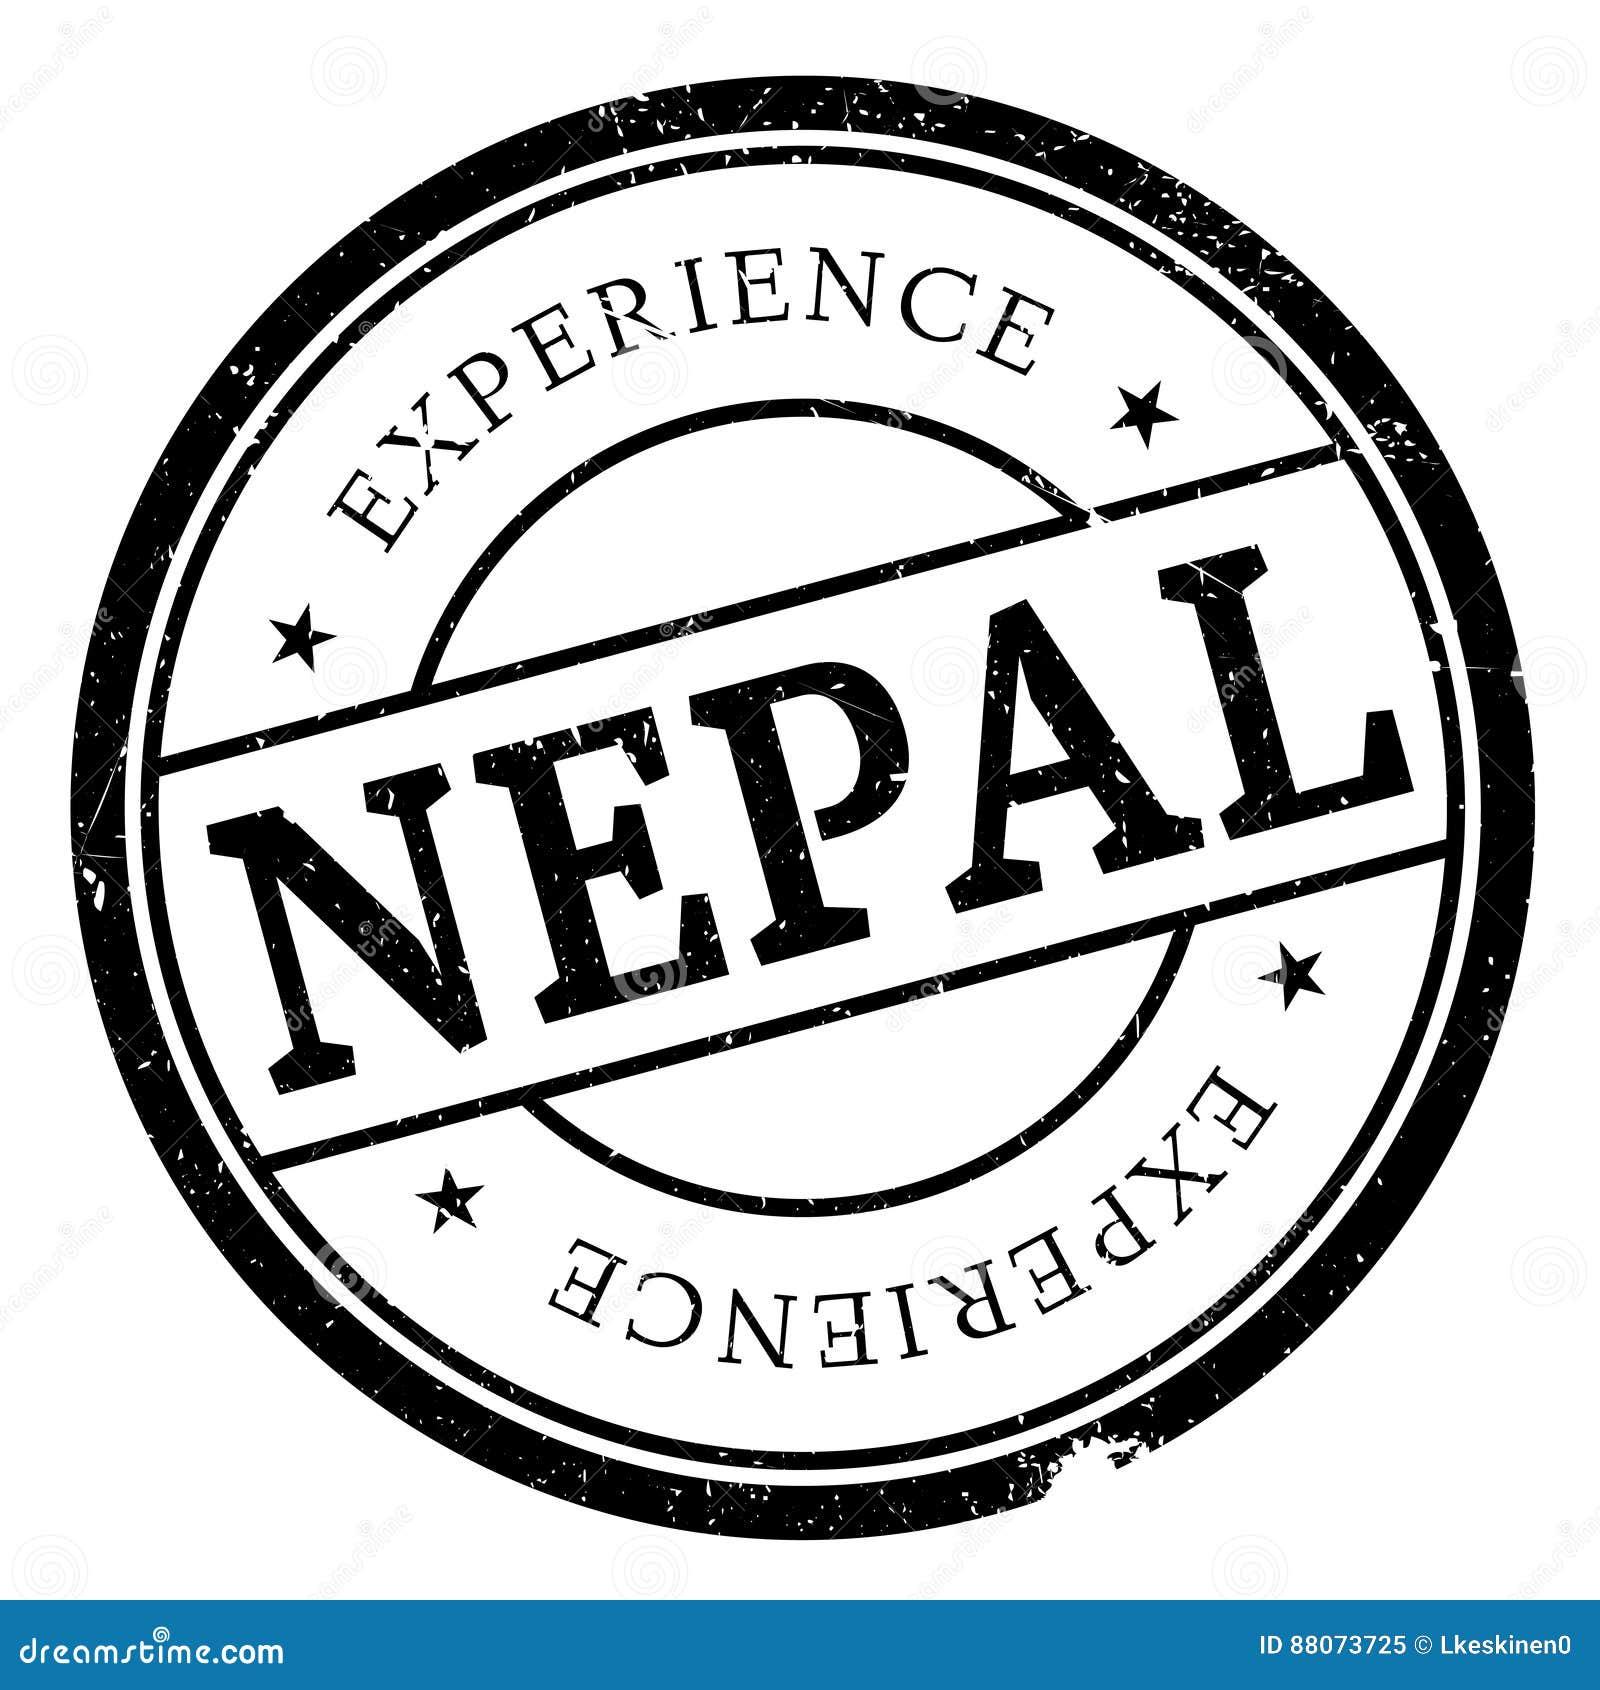 nepal st rubber grunge stock illustration illustration of label Physical Map of Mount Elbrus nepal st rubber grunge